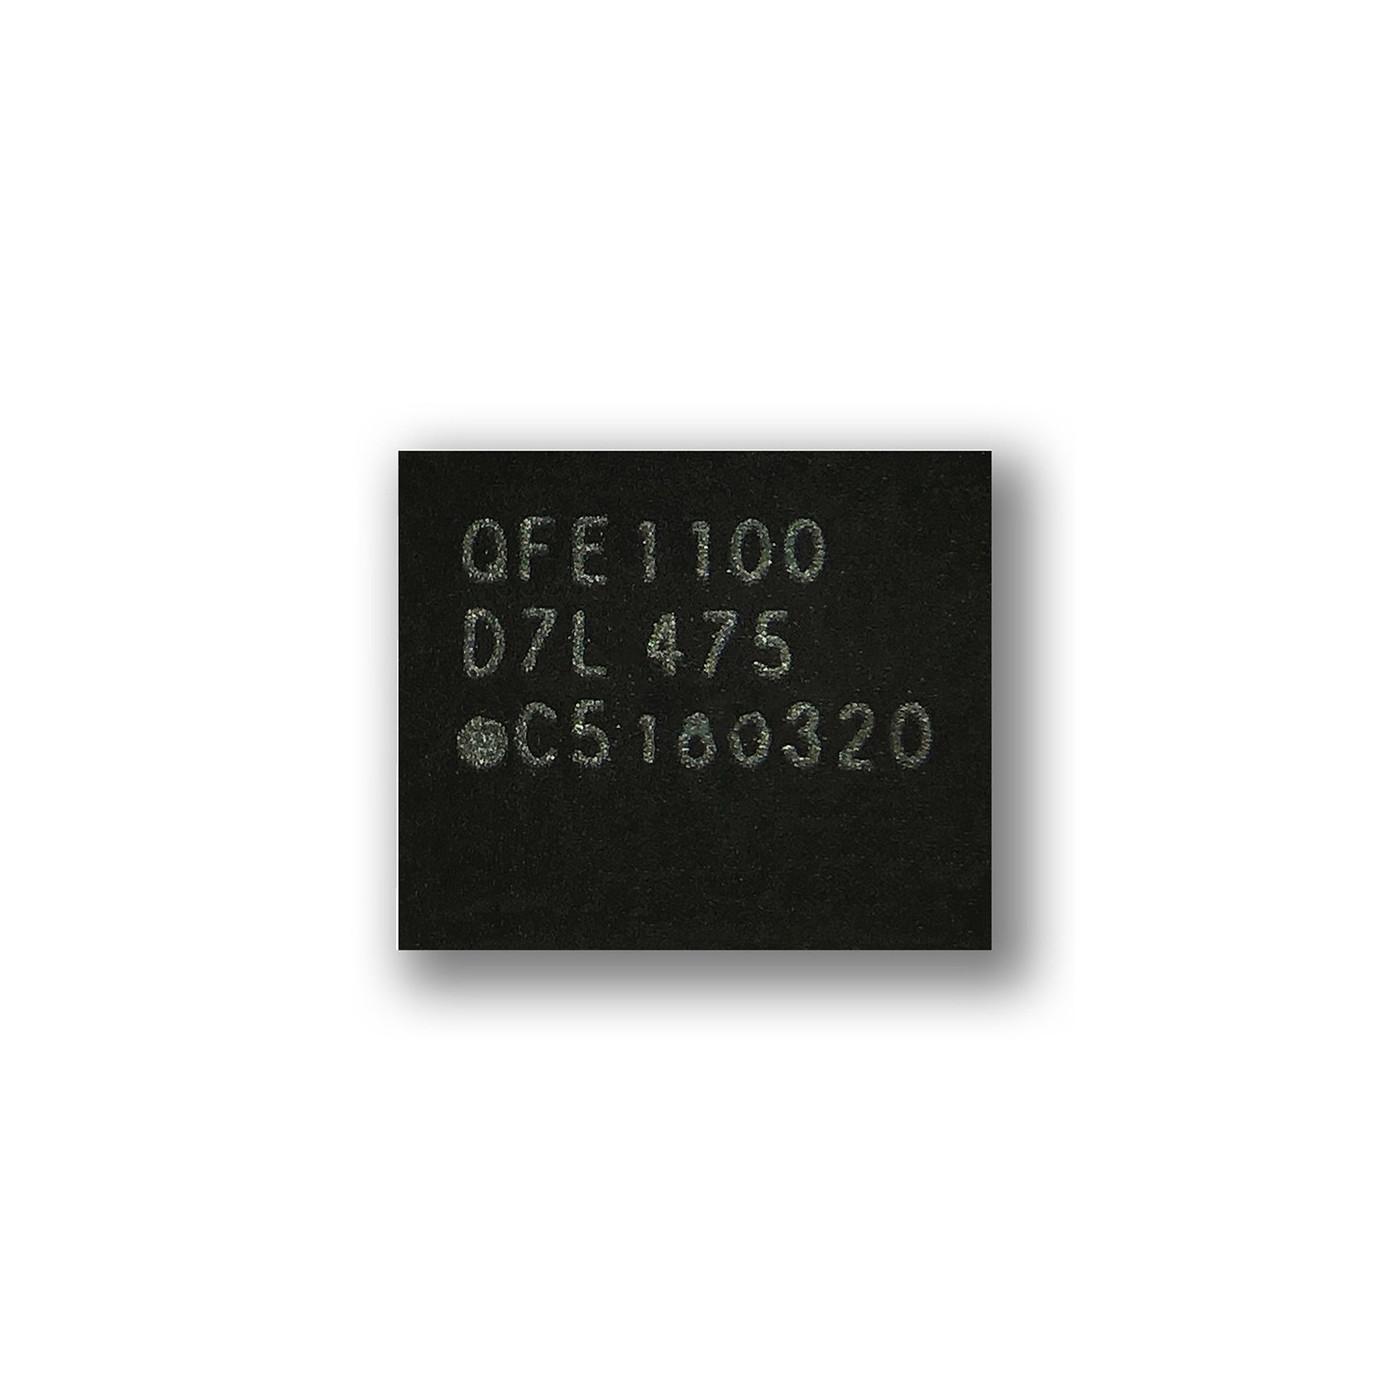 IC CHIP POWER DES SIGNALS QFE1100 FÜR APPLE IPHONE 6S - 6S PLUS POWER SIGNAL